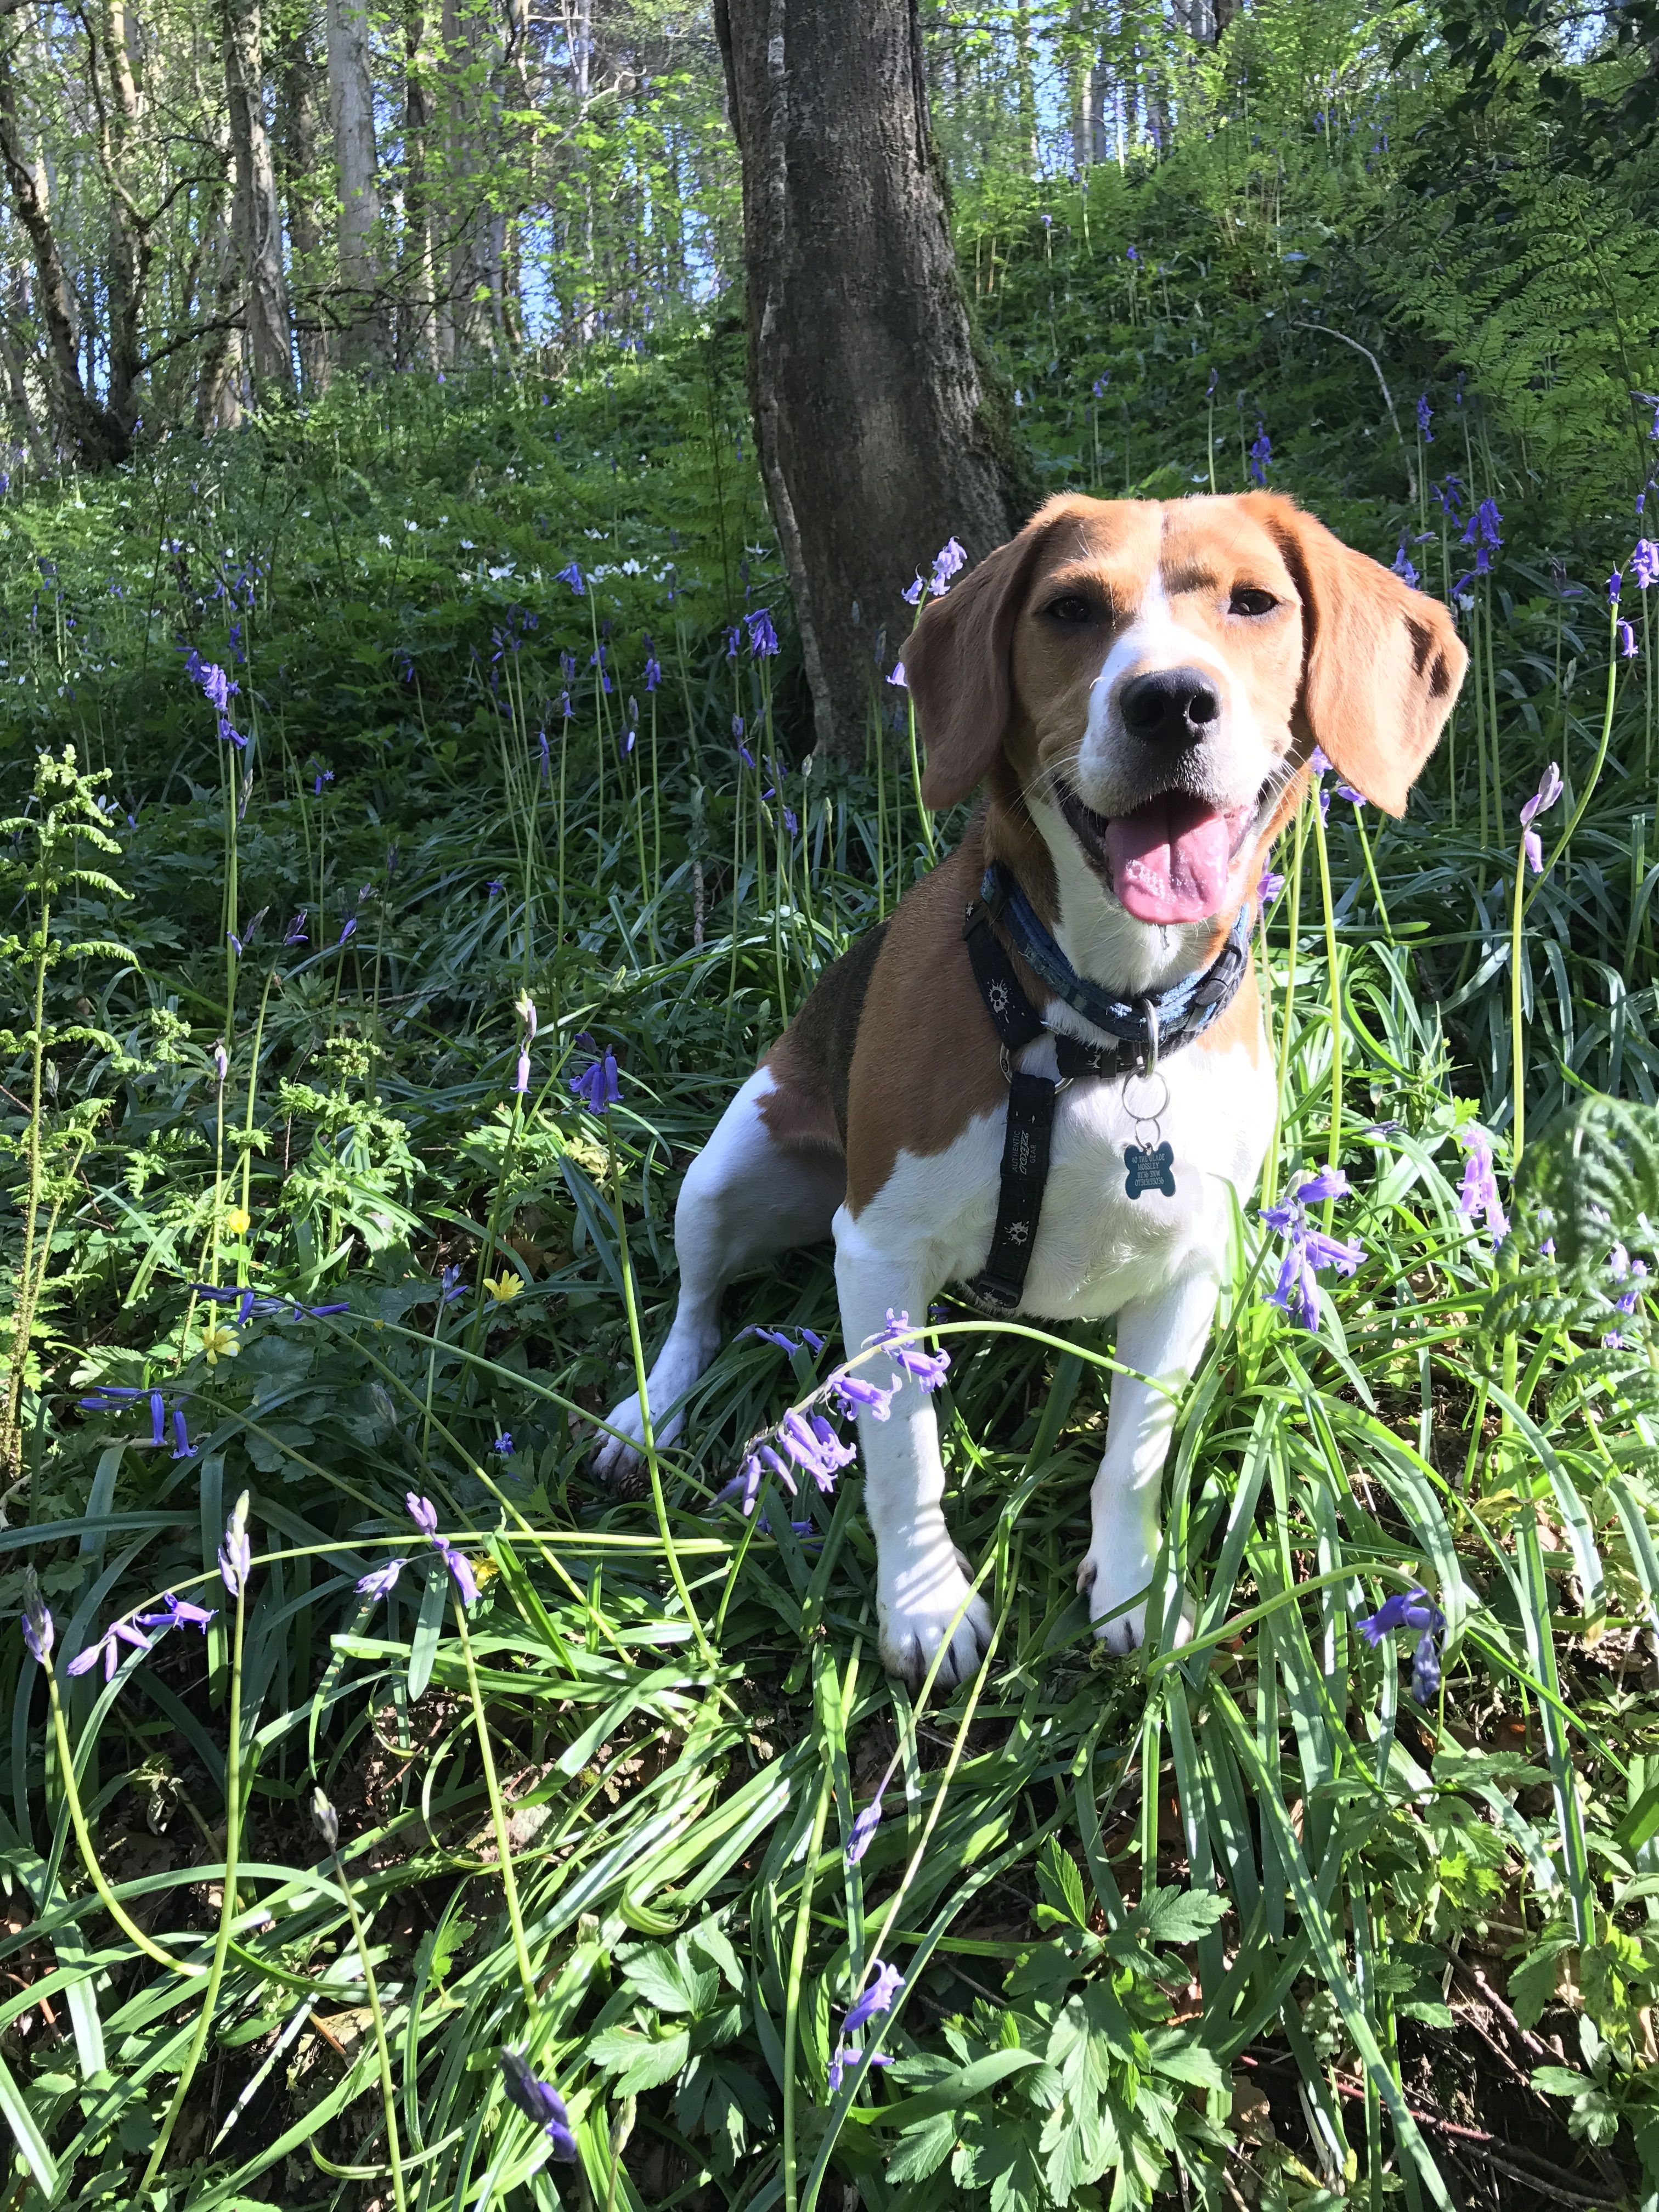 Pin by Rhonda Blonowicz on Hector the beagle Beagle, Dog